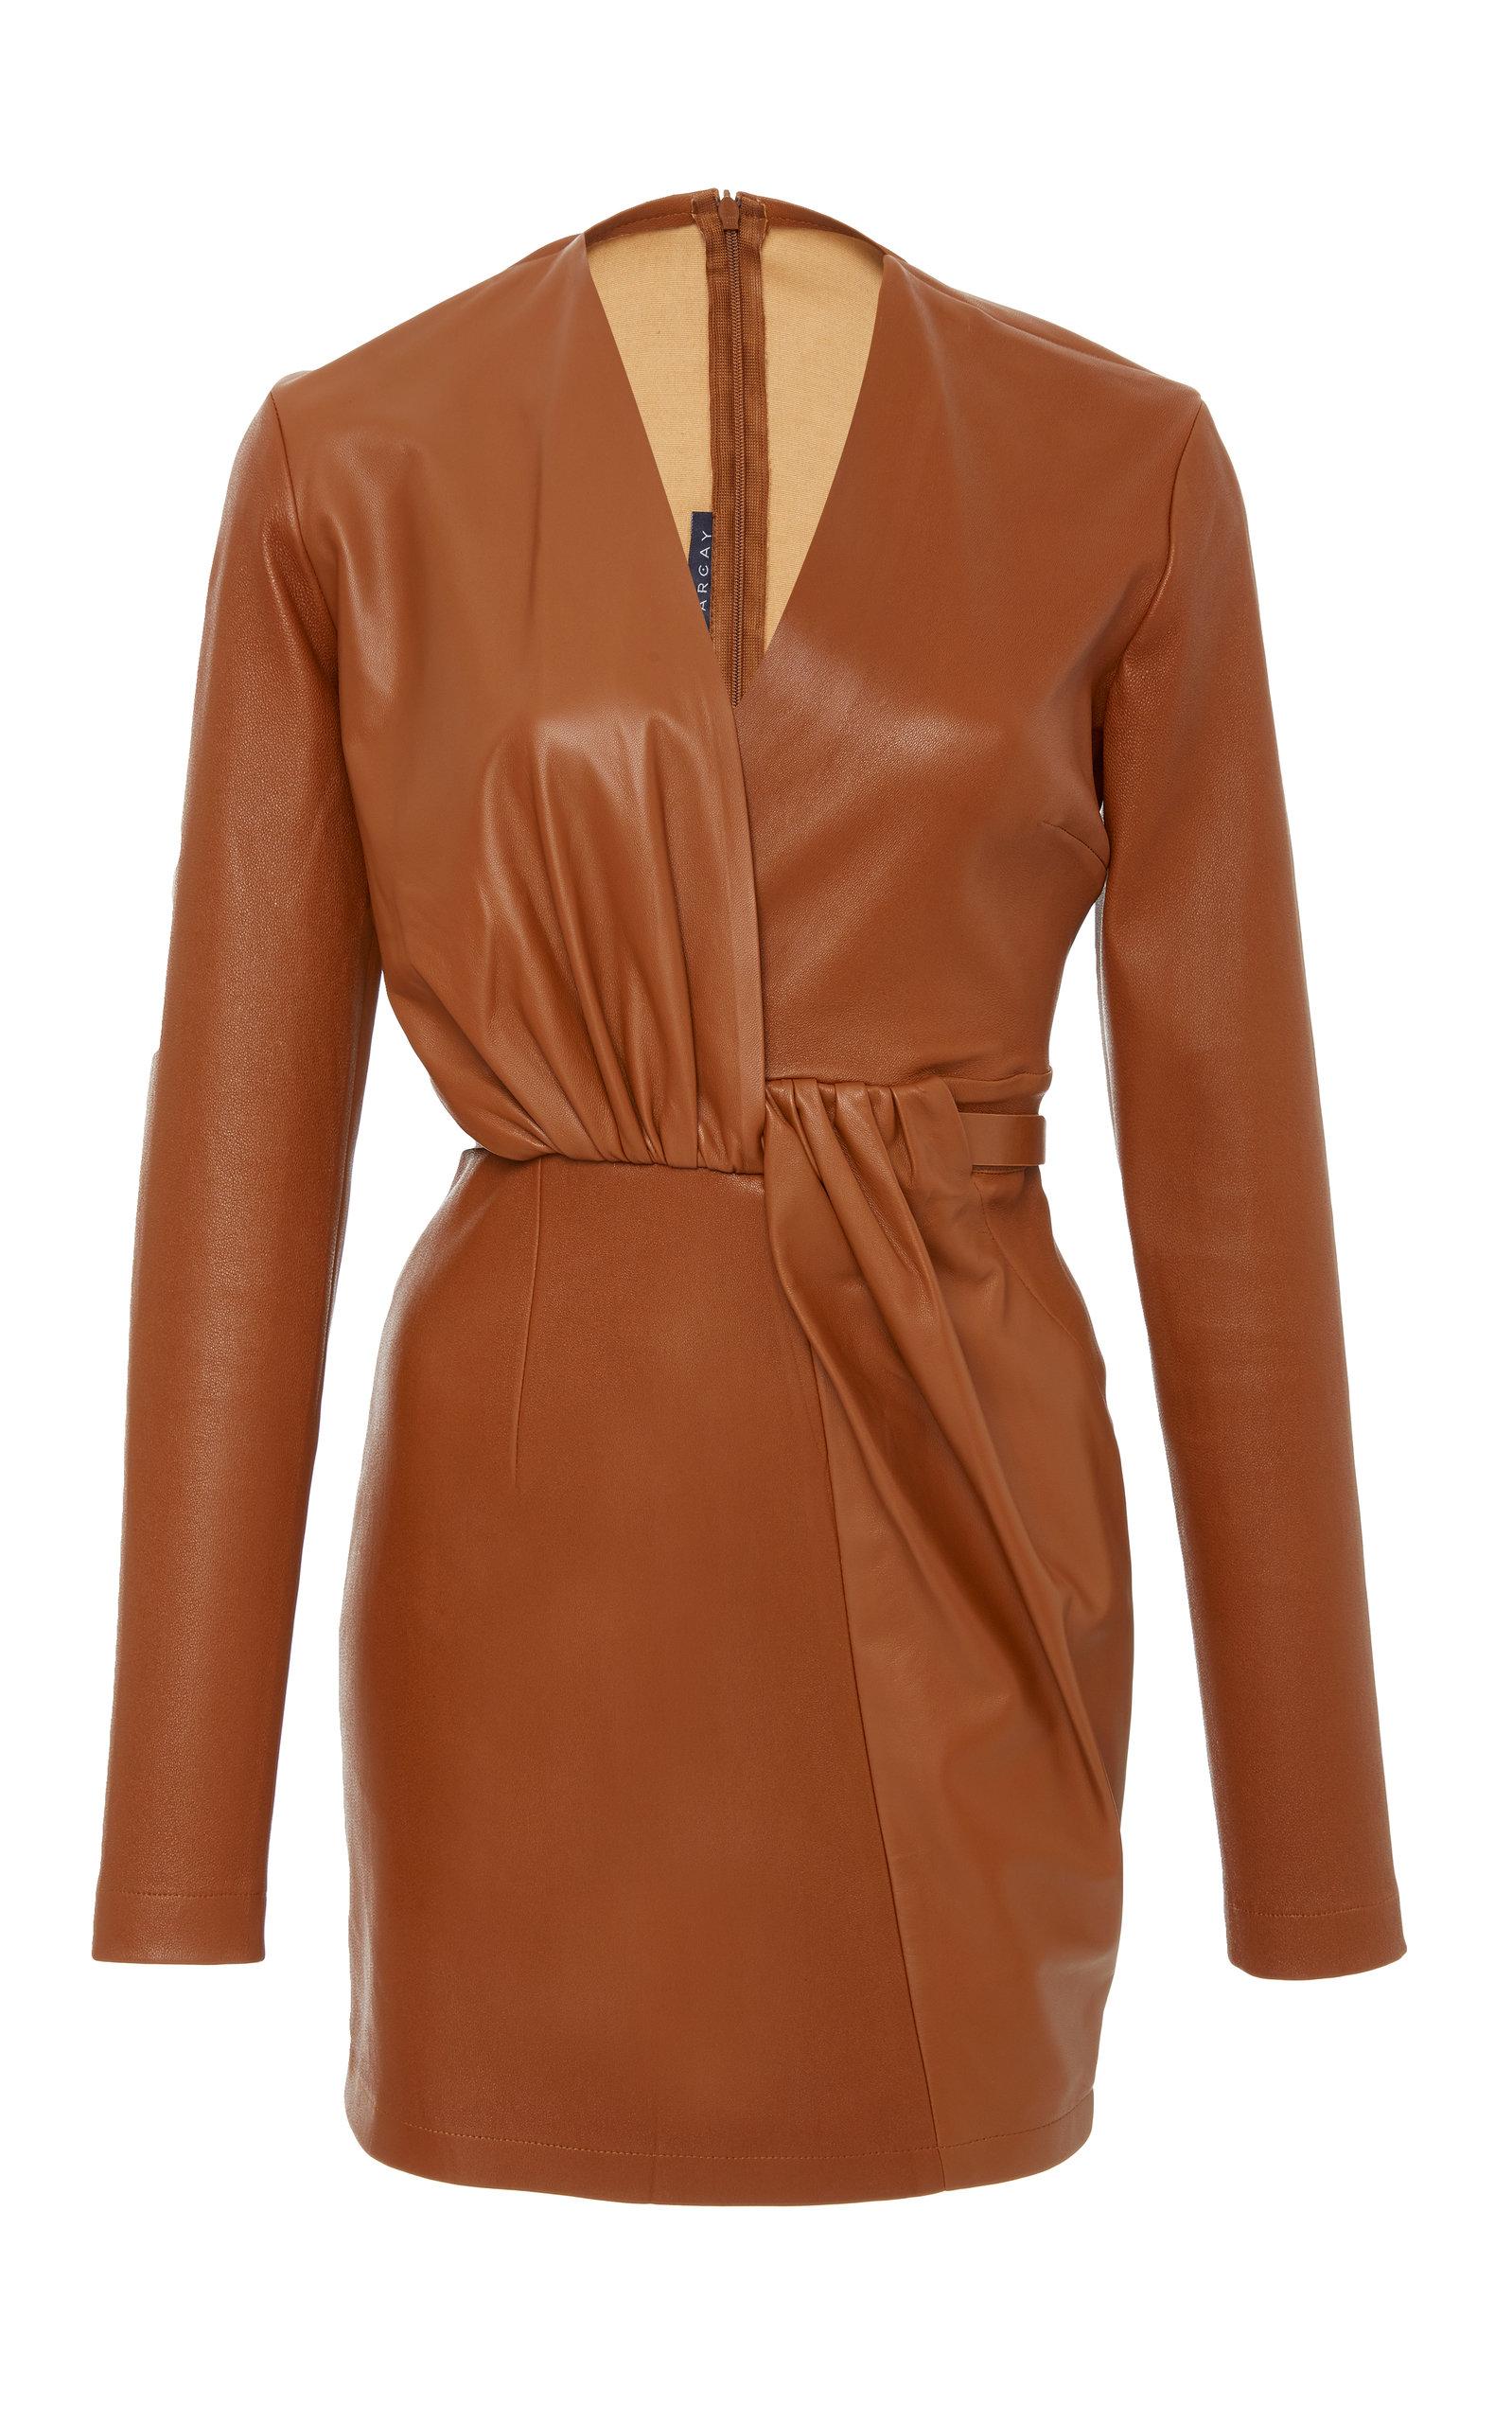 ZEYNEP ARCAY Leather Mini Dress in Brown